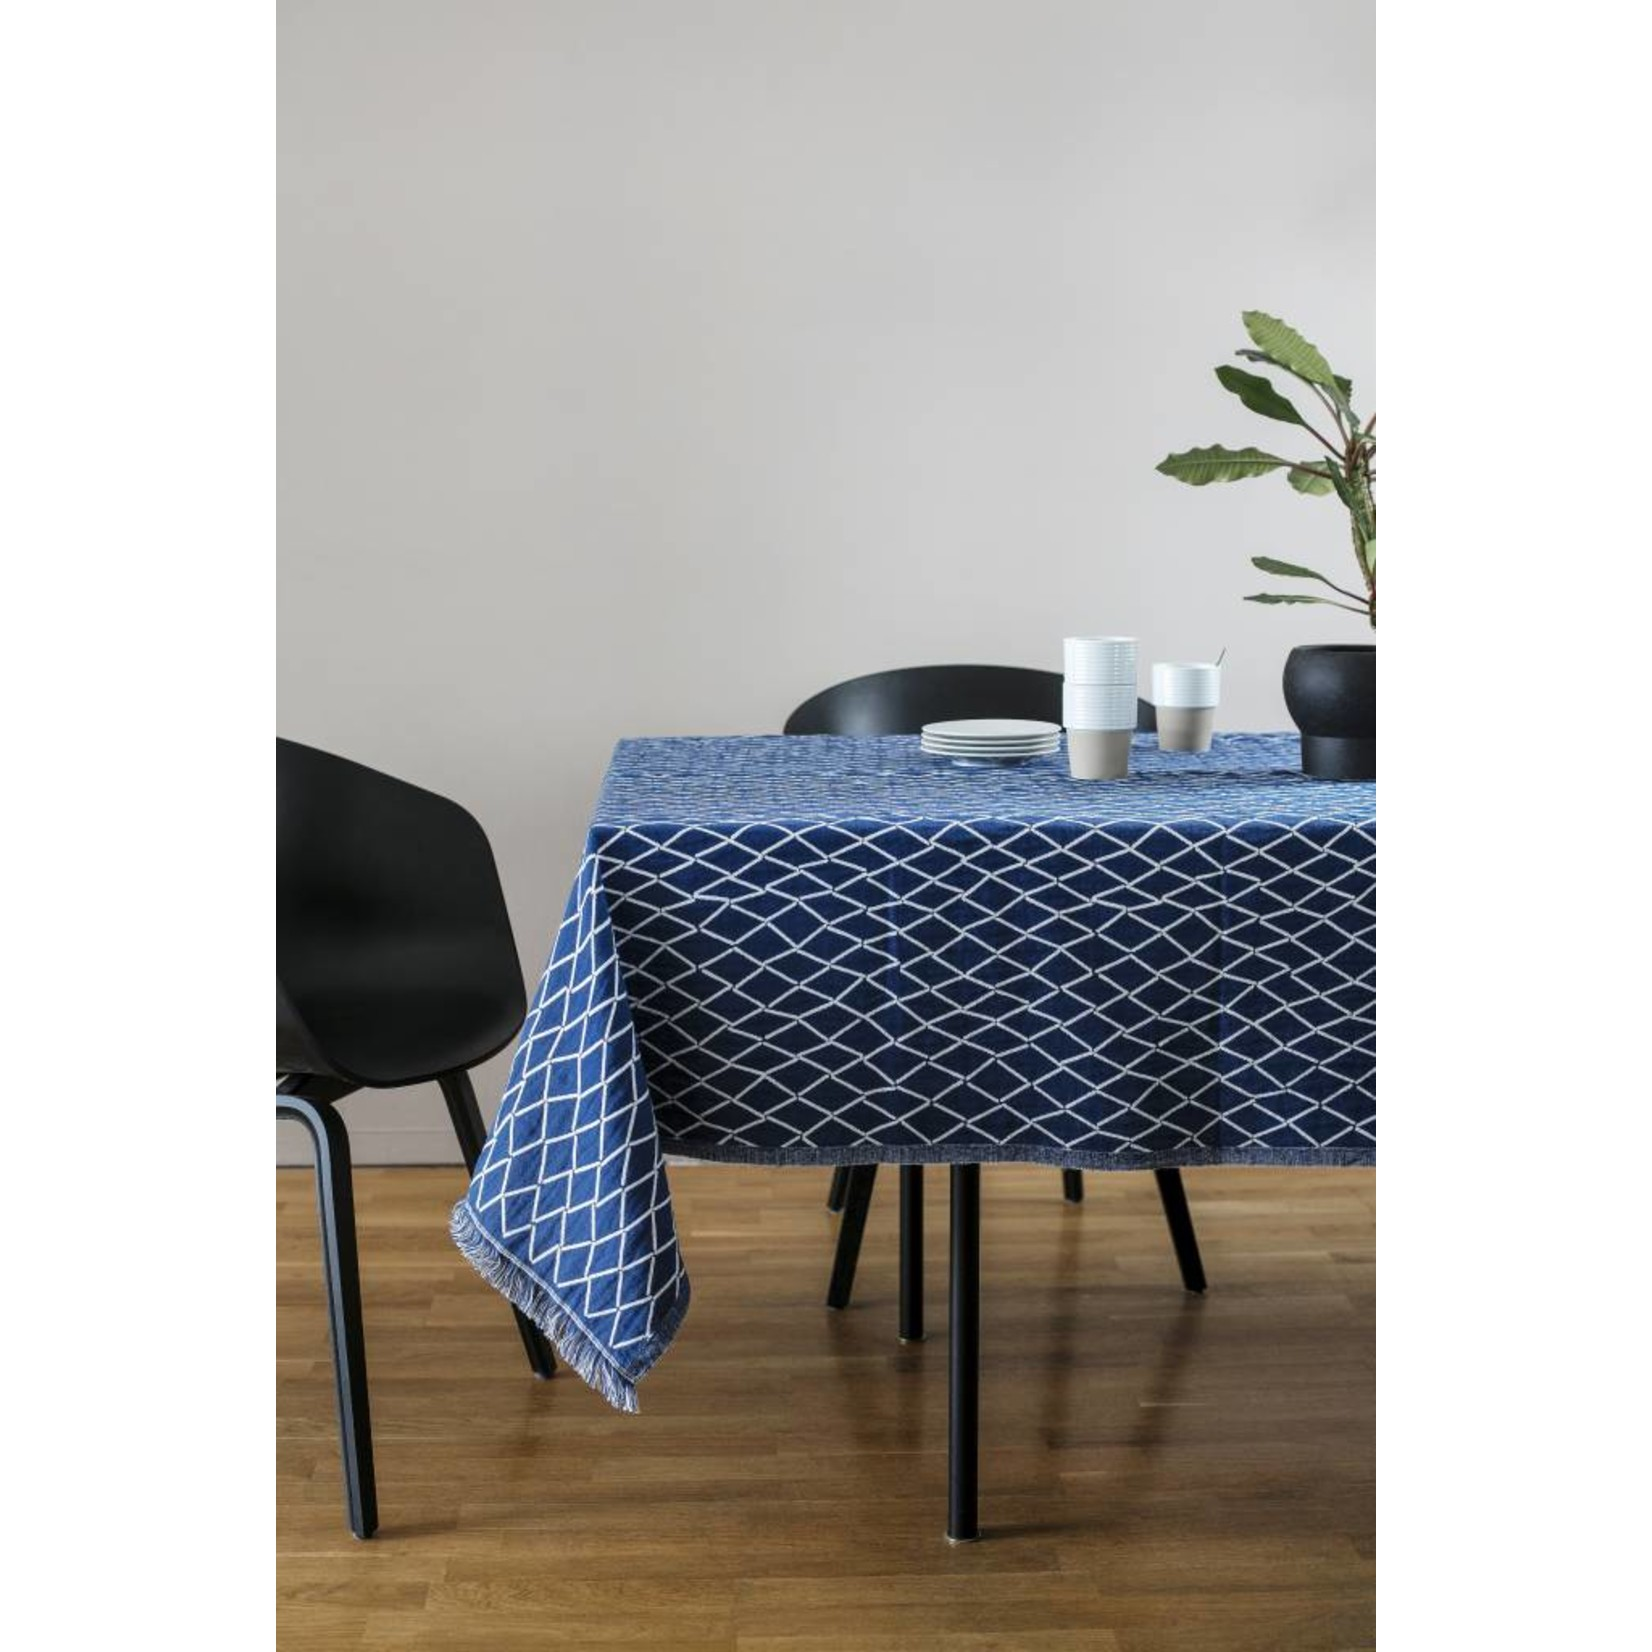 Lapuan Kankurit ESKIMO tafellaken & deken linnen & biokatoen - blauw en wit